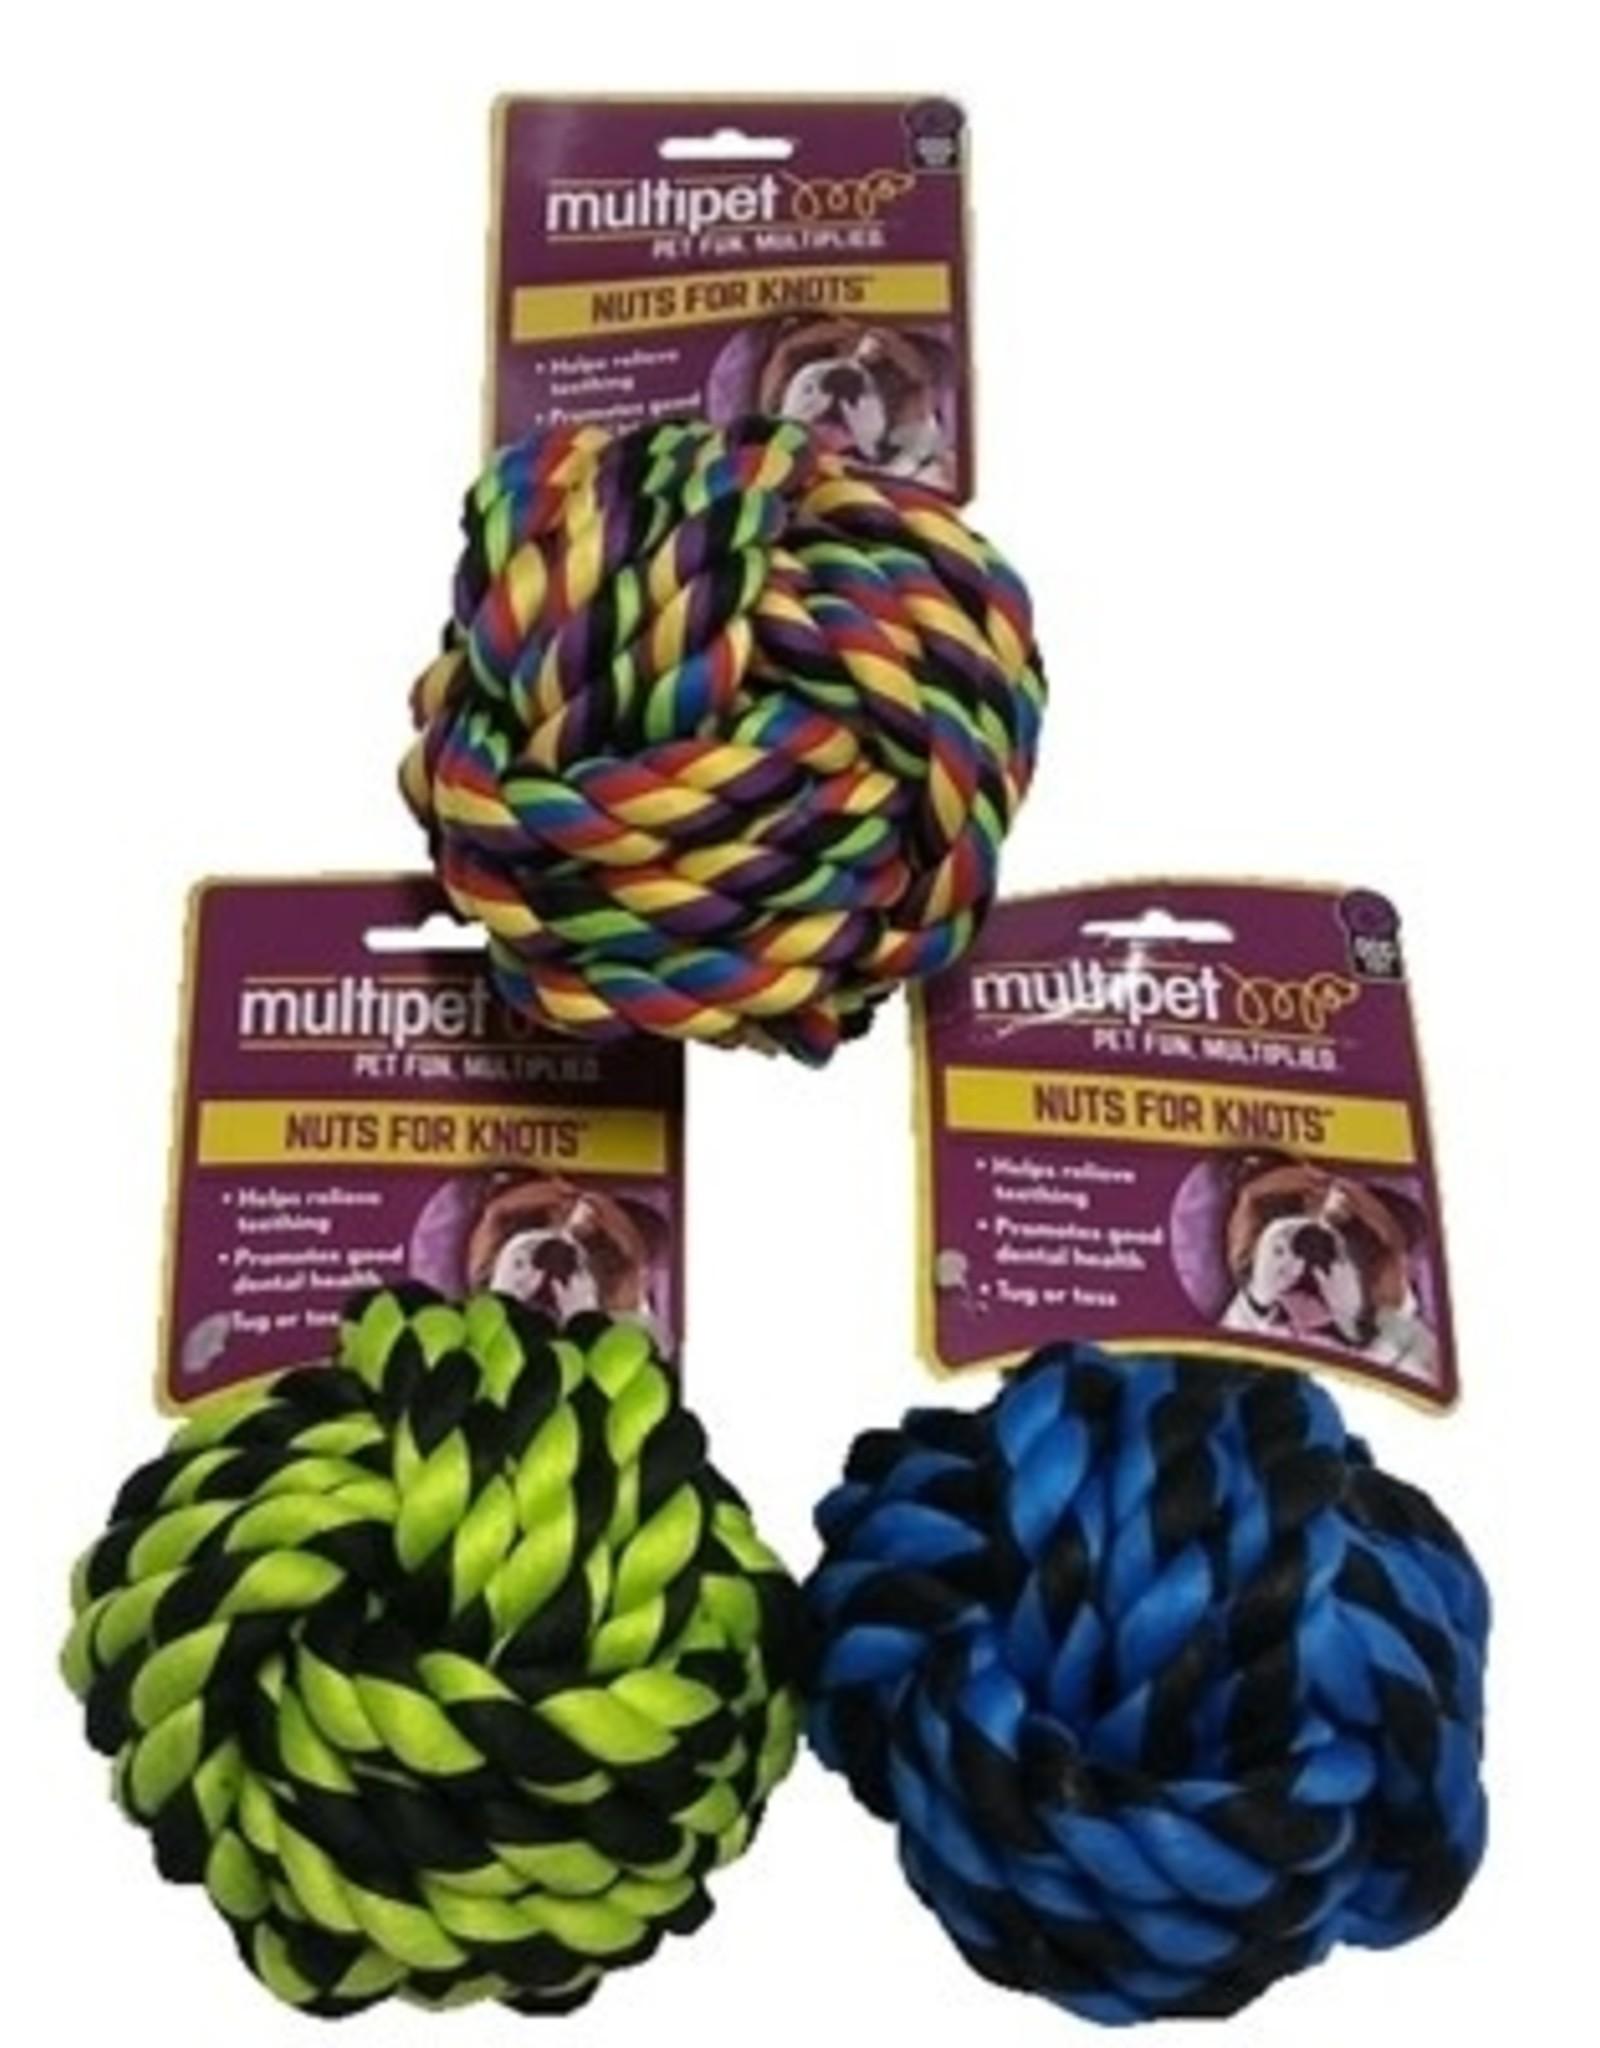 Multipet Mulitipet Nuts for Knots Ball